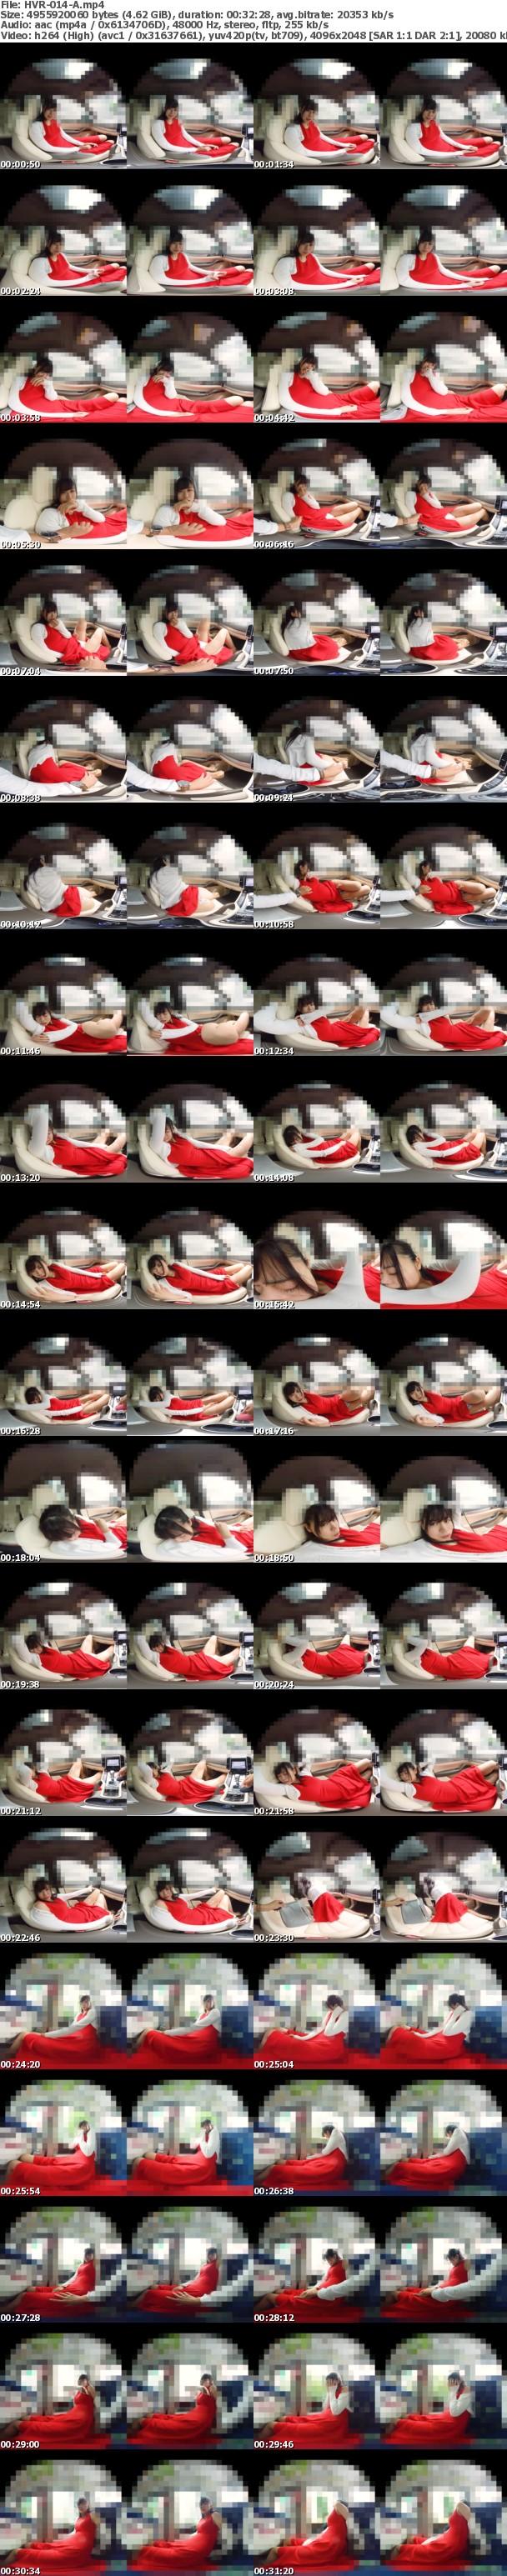 (VR) HVR-014 【路線バス×リモバイ絶頂】高身長×美スレンダーボディの信用金庫職員に中出し!JD時代に助教授のイタズラで開花したドM性癖が大爆発!野外露出でマゾ濡れするド変態女子が異常なほどイキ狂う!!